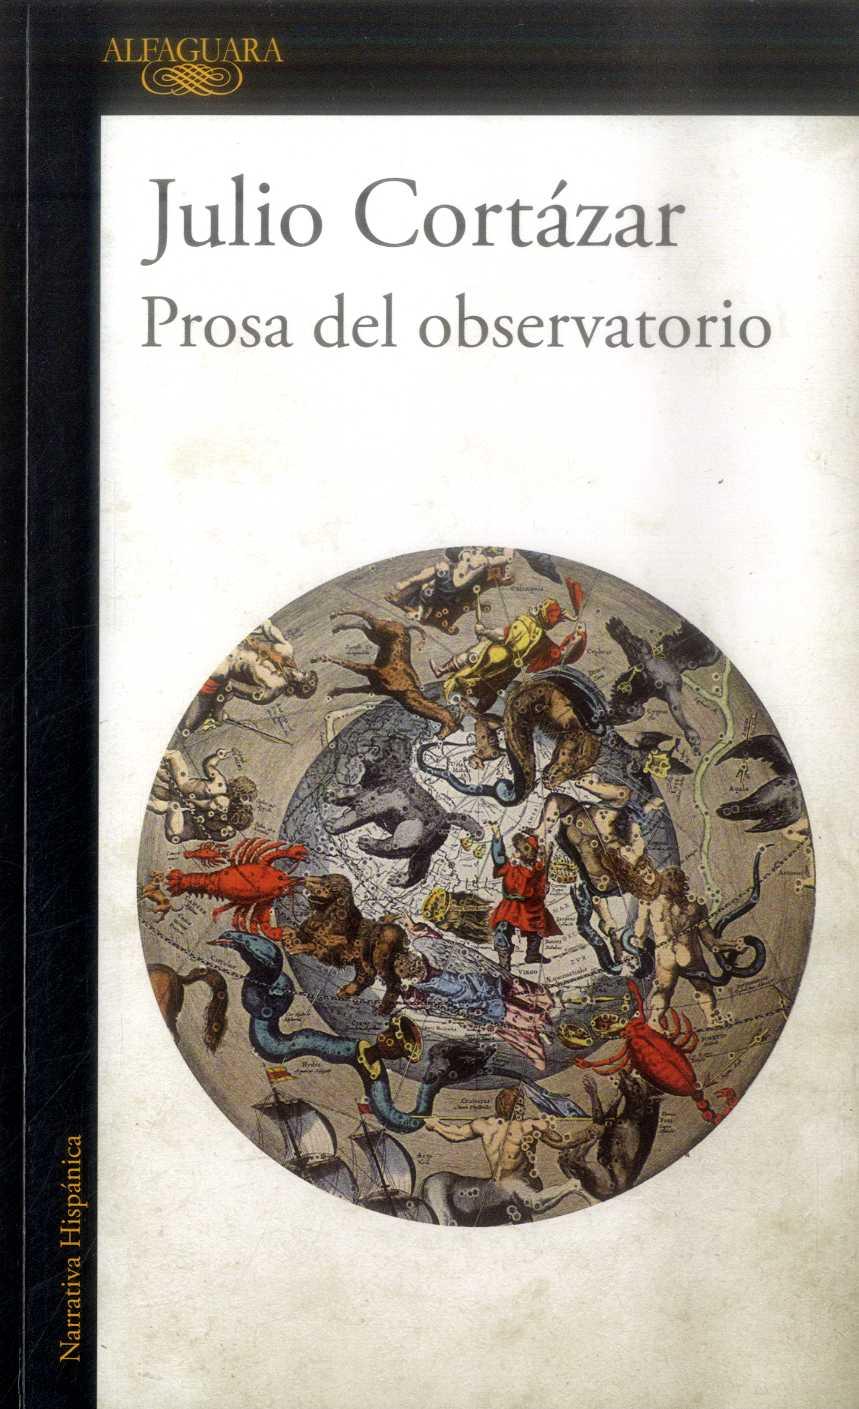 Prosa del Observatorio - Julio Cortázar - Alfaguara